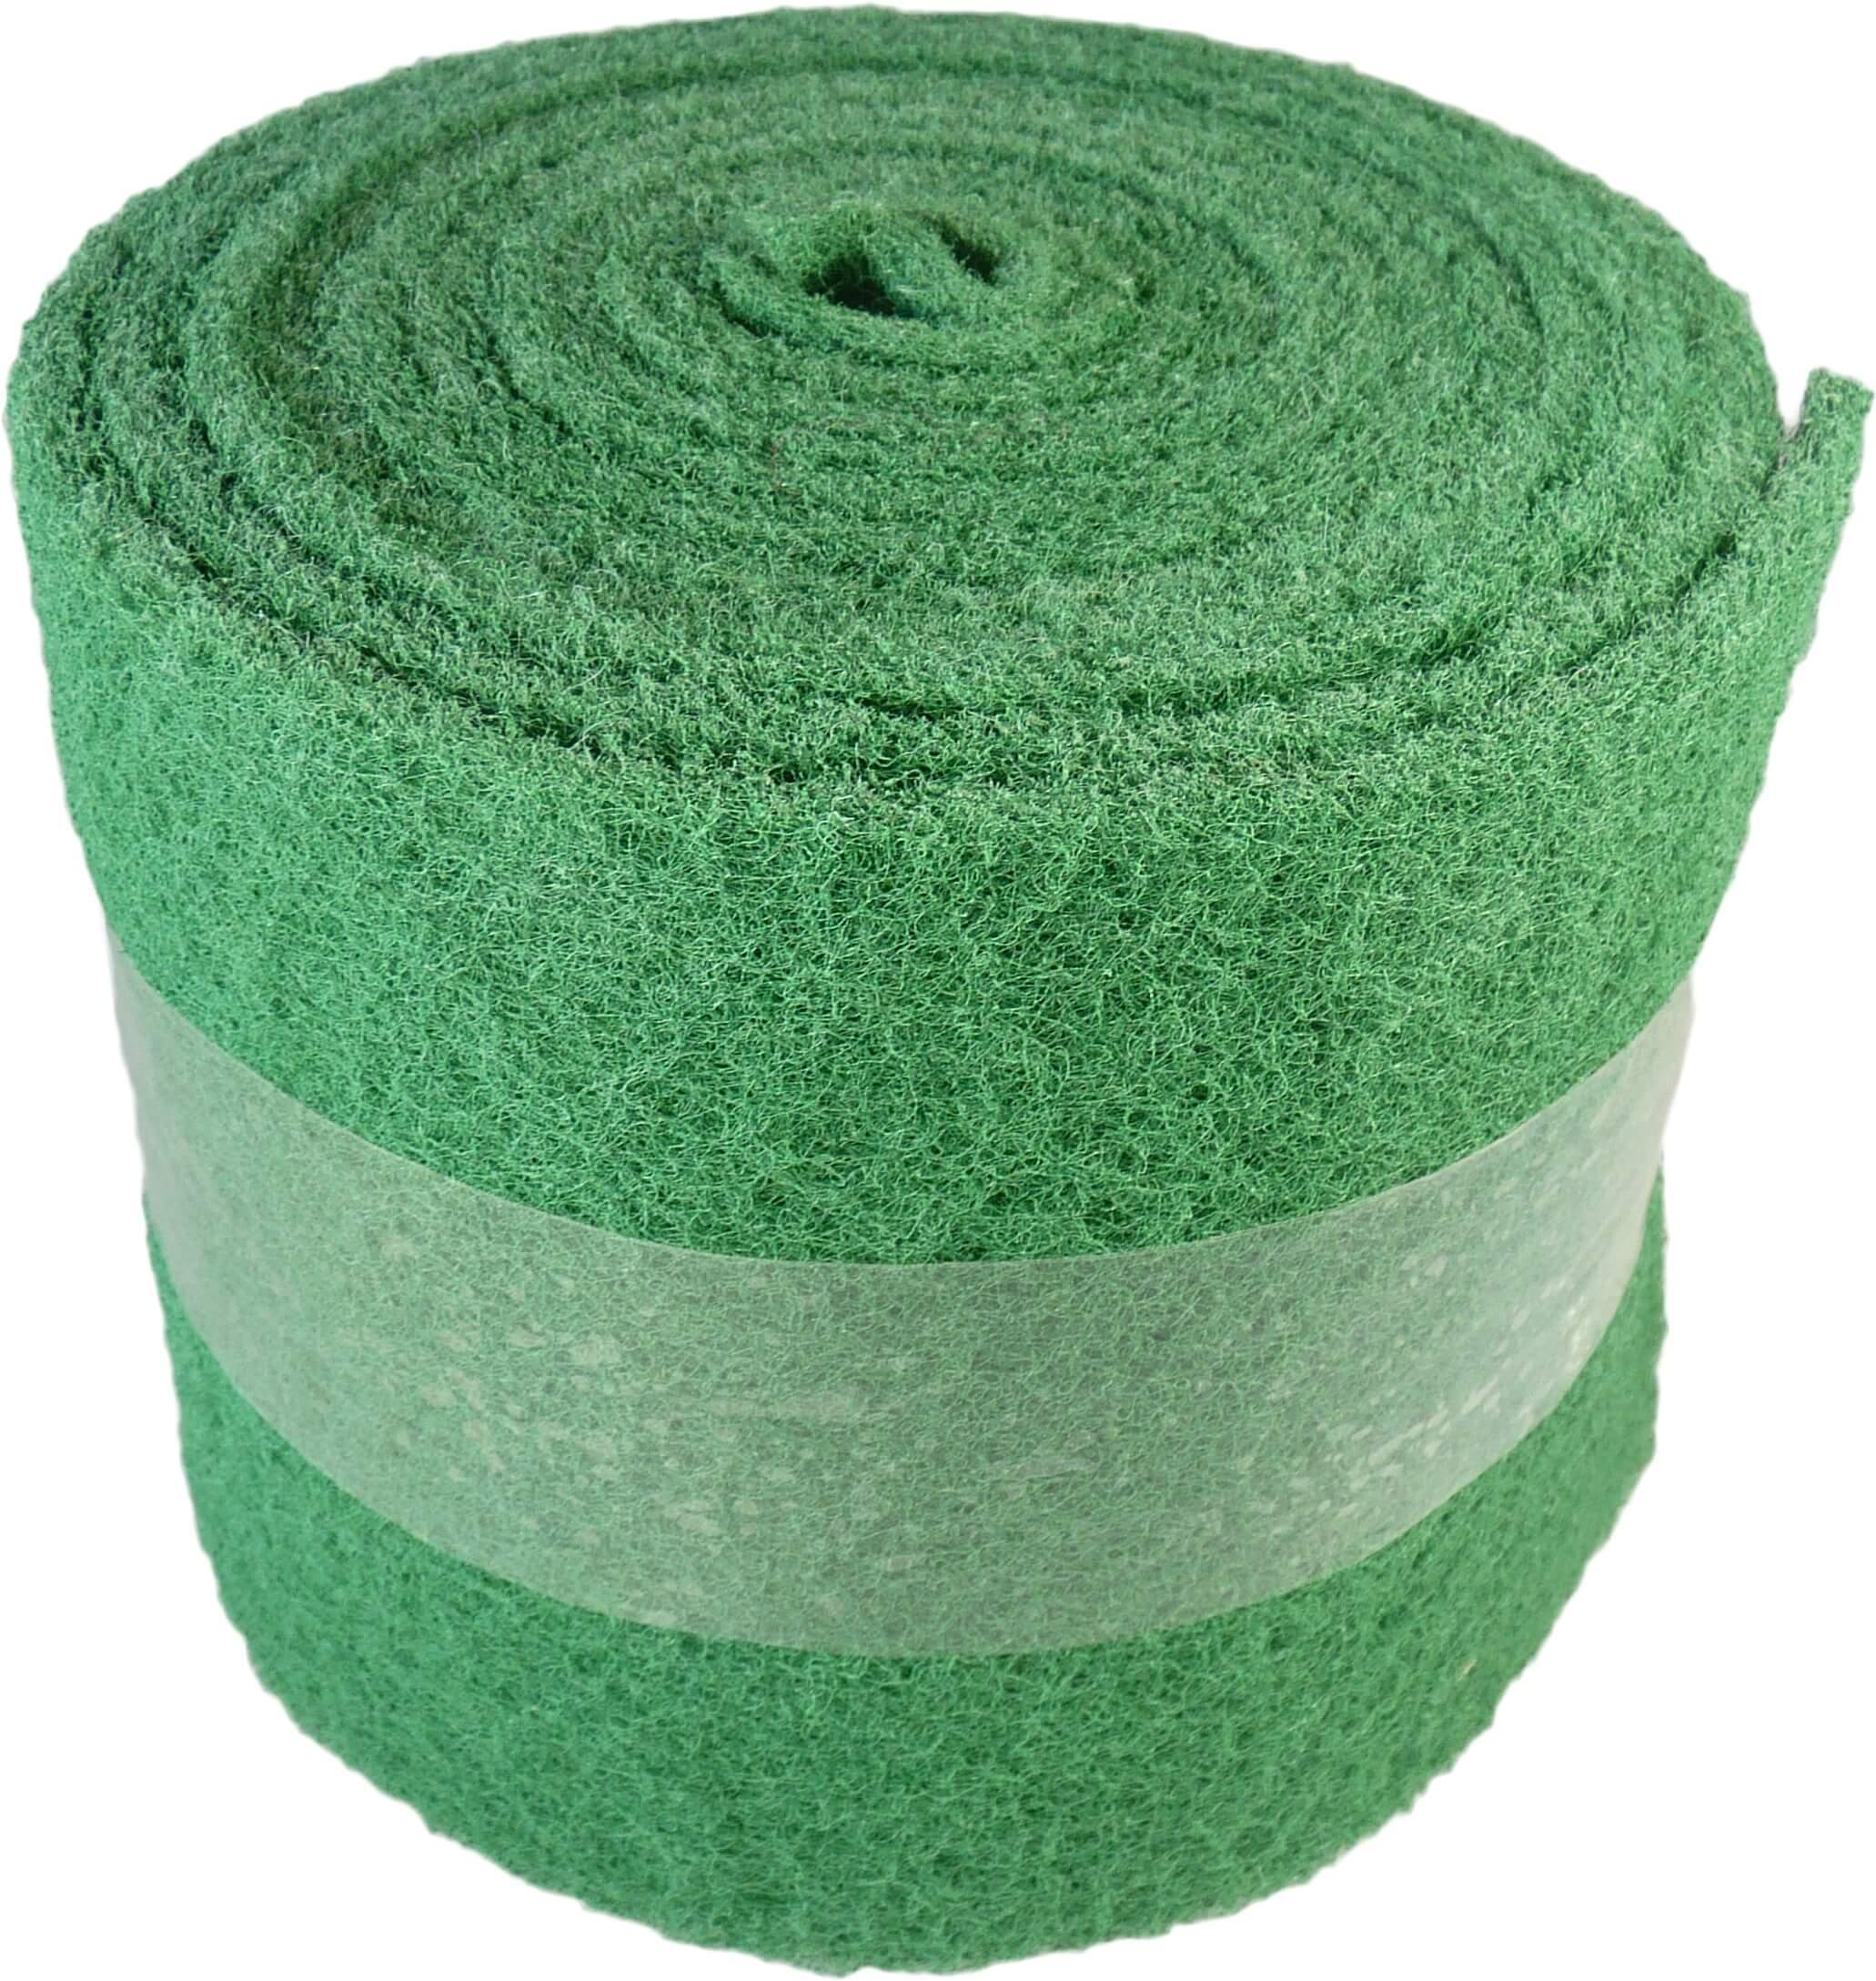 colorant alimentaire liquide vert pistache mallard ferriere - Colorant Alimentaire Vert Pistache